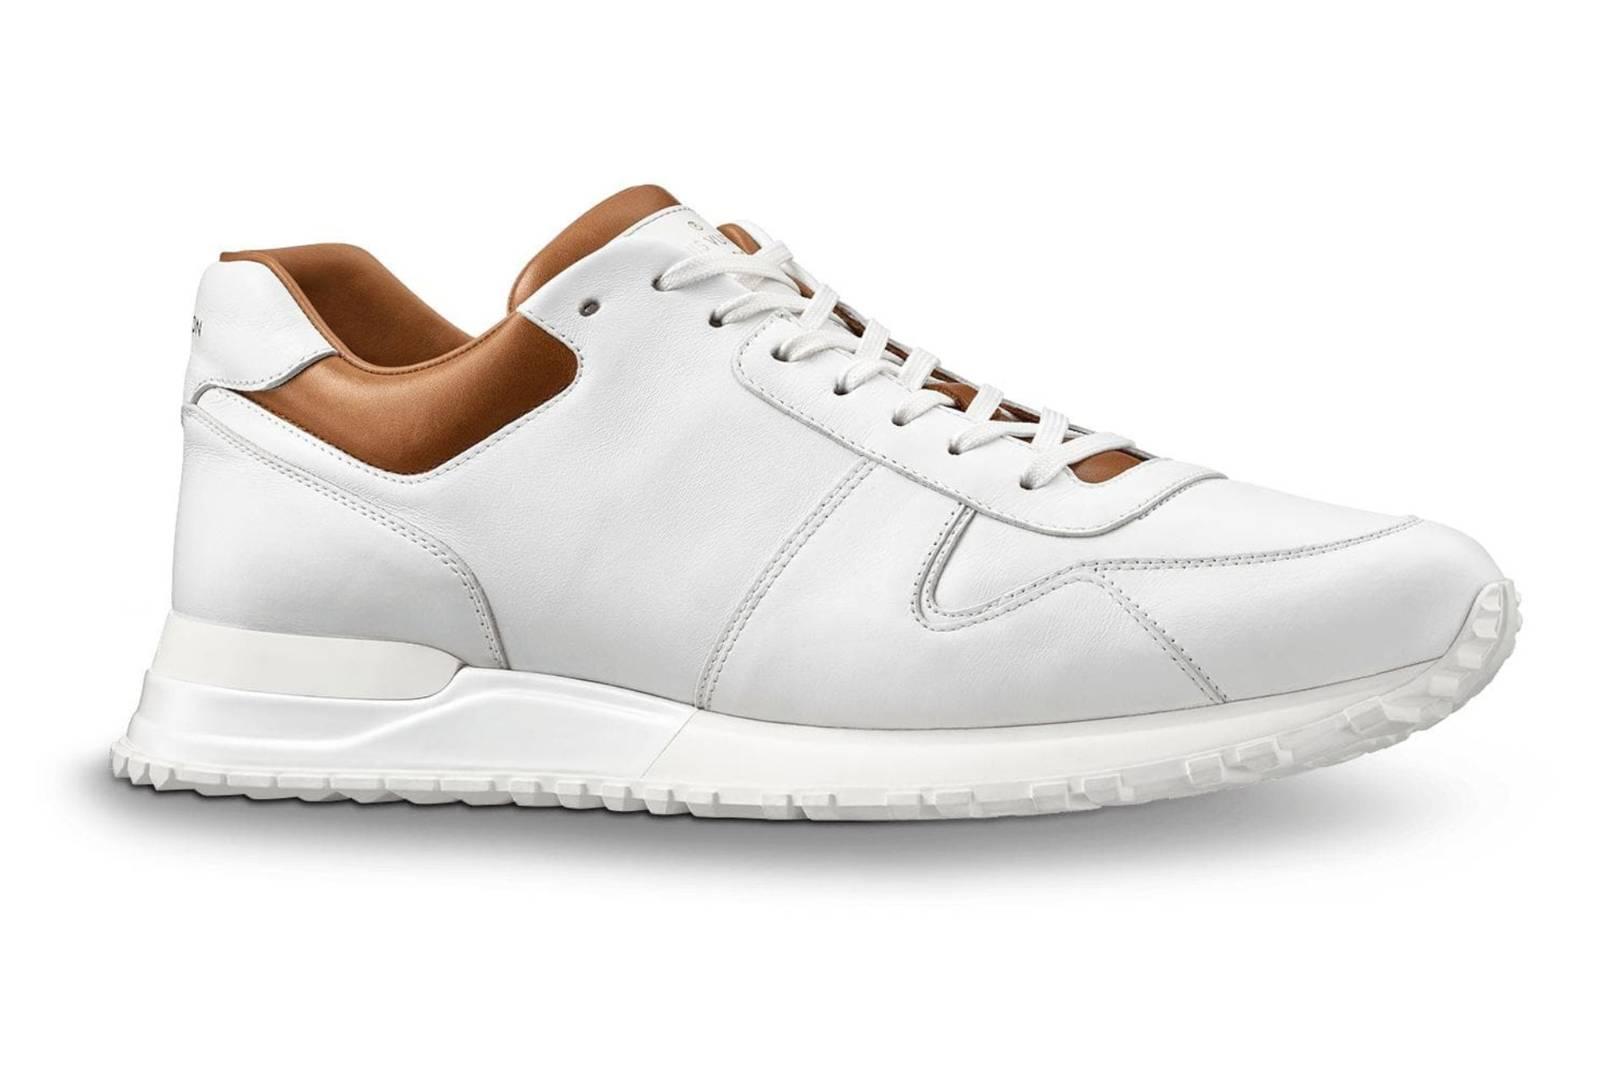 264b32915e3 Mens footwear trends Autumn Winter 2018  Goodbye summer shoes ...